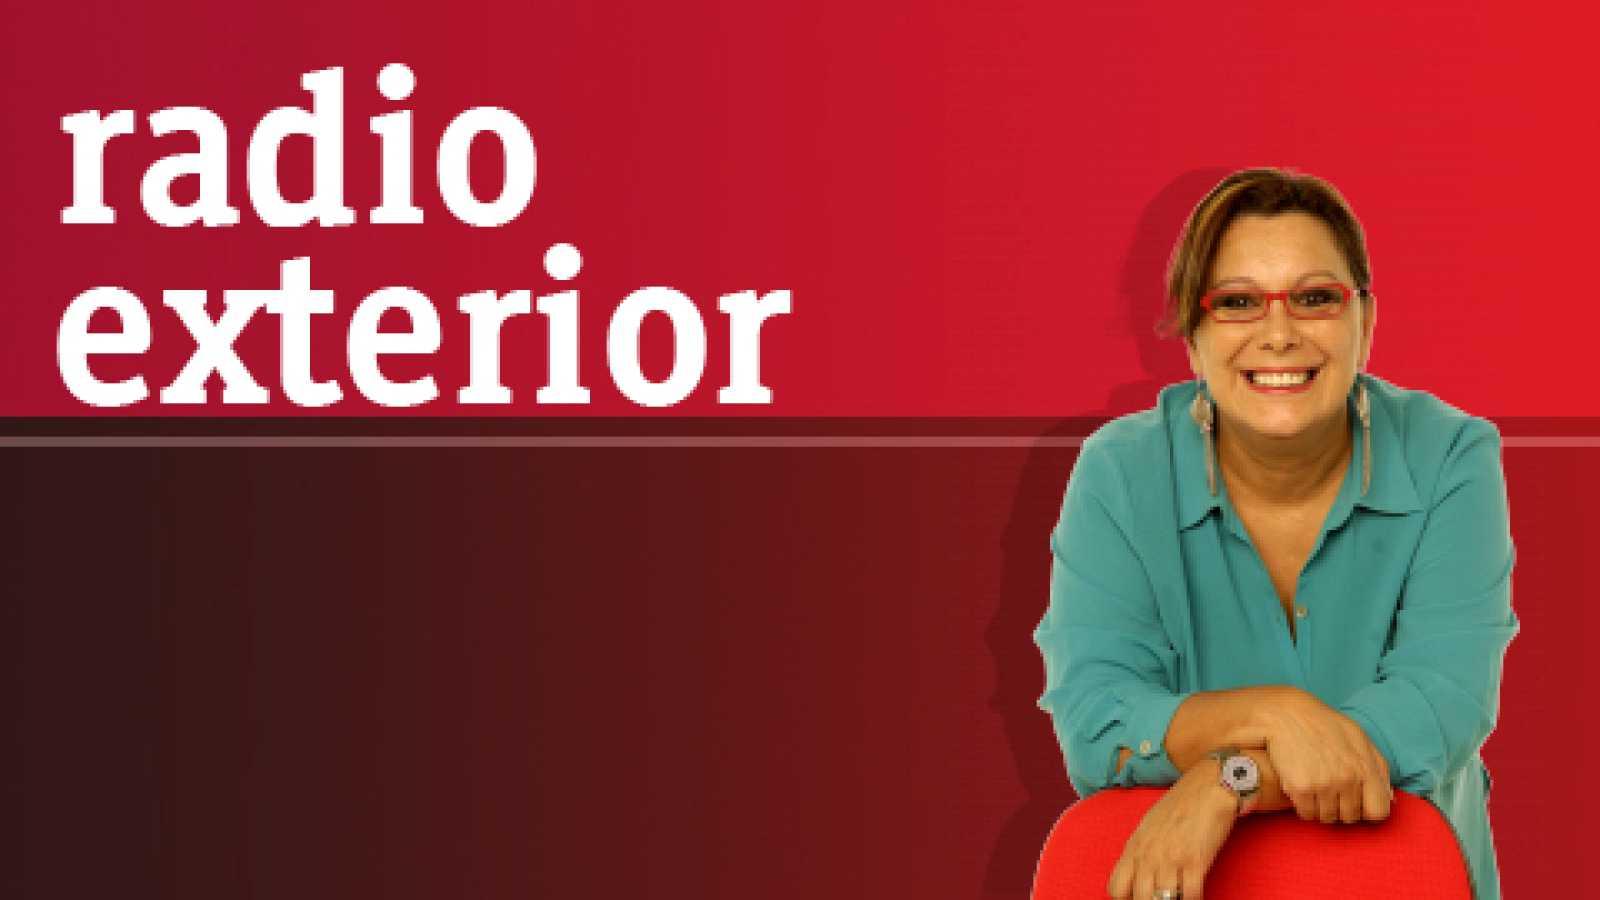 Mundo solidario - Balance gran recogida de alimentos - 27/12/20 - escuchar ahora